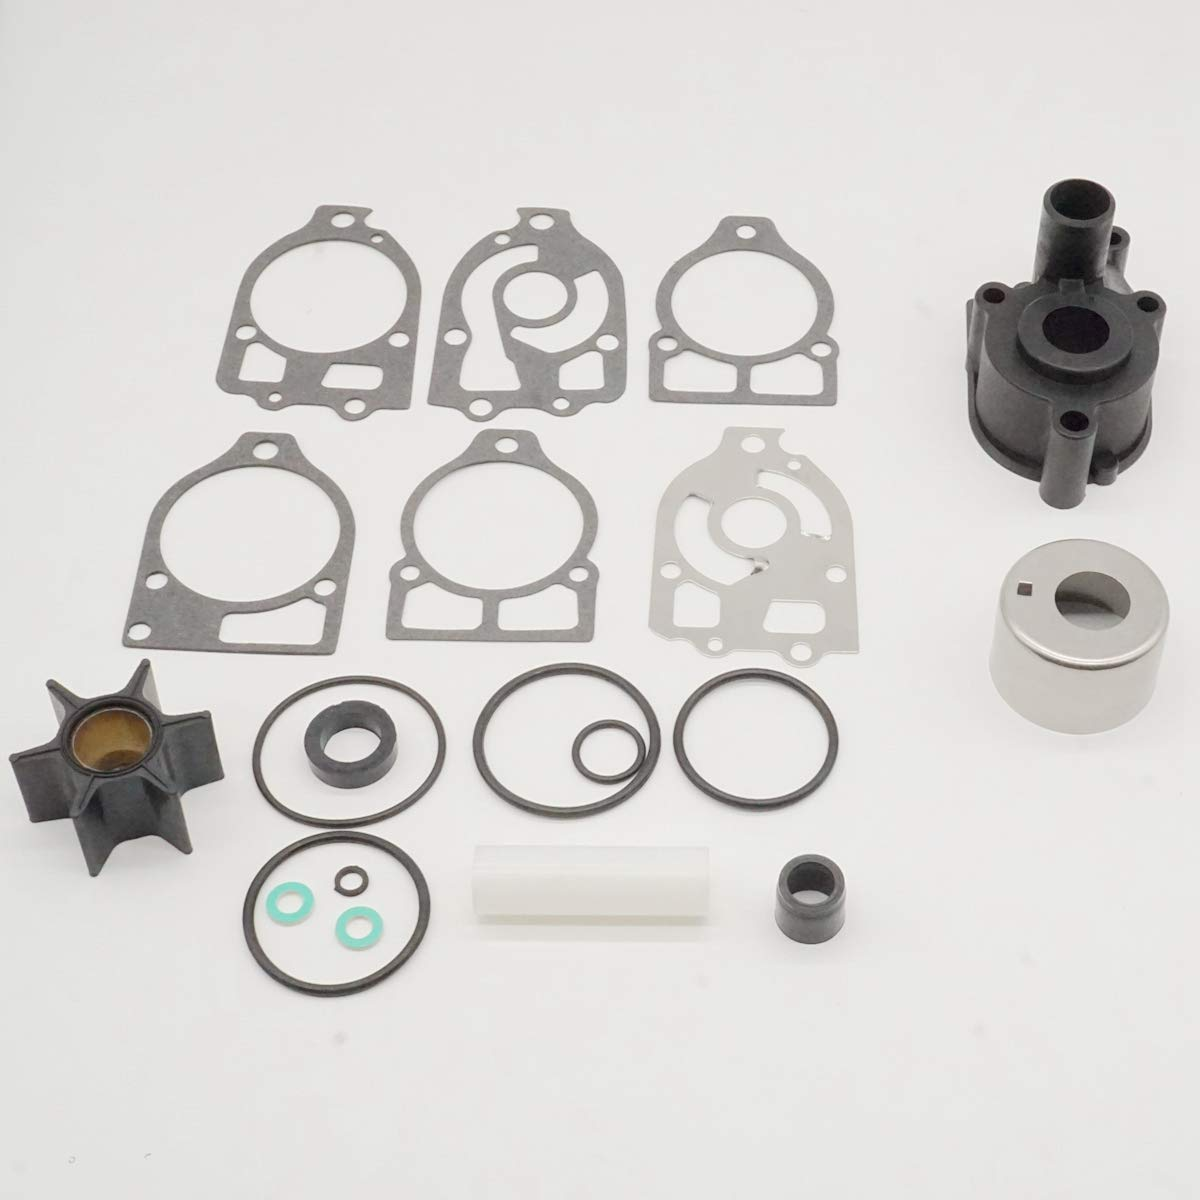 GHmarine Water Pump Impeller Kit for Mercruiser Alpha One 46-96148A8 46-96148Q8 46-96148T8 46-96148A5 46-42579A4 46-44292A4 46-48747A3